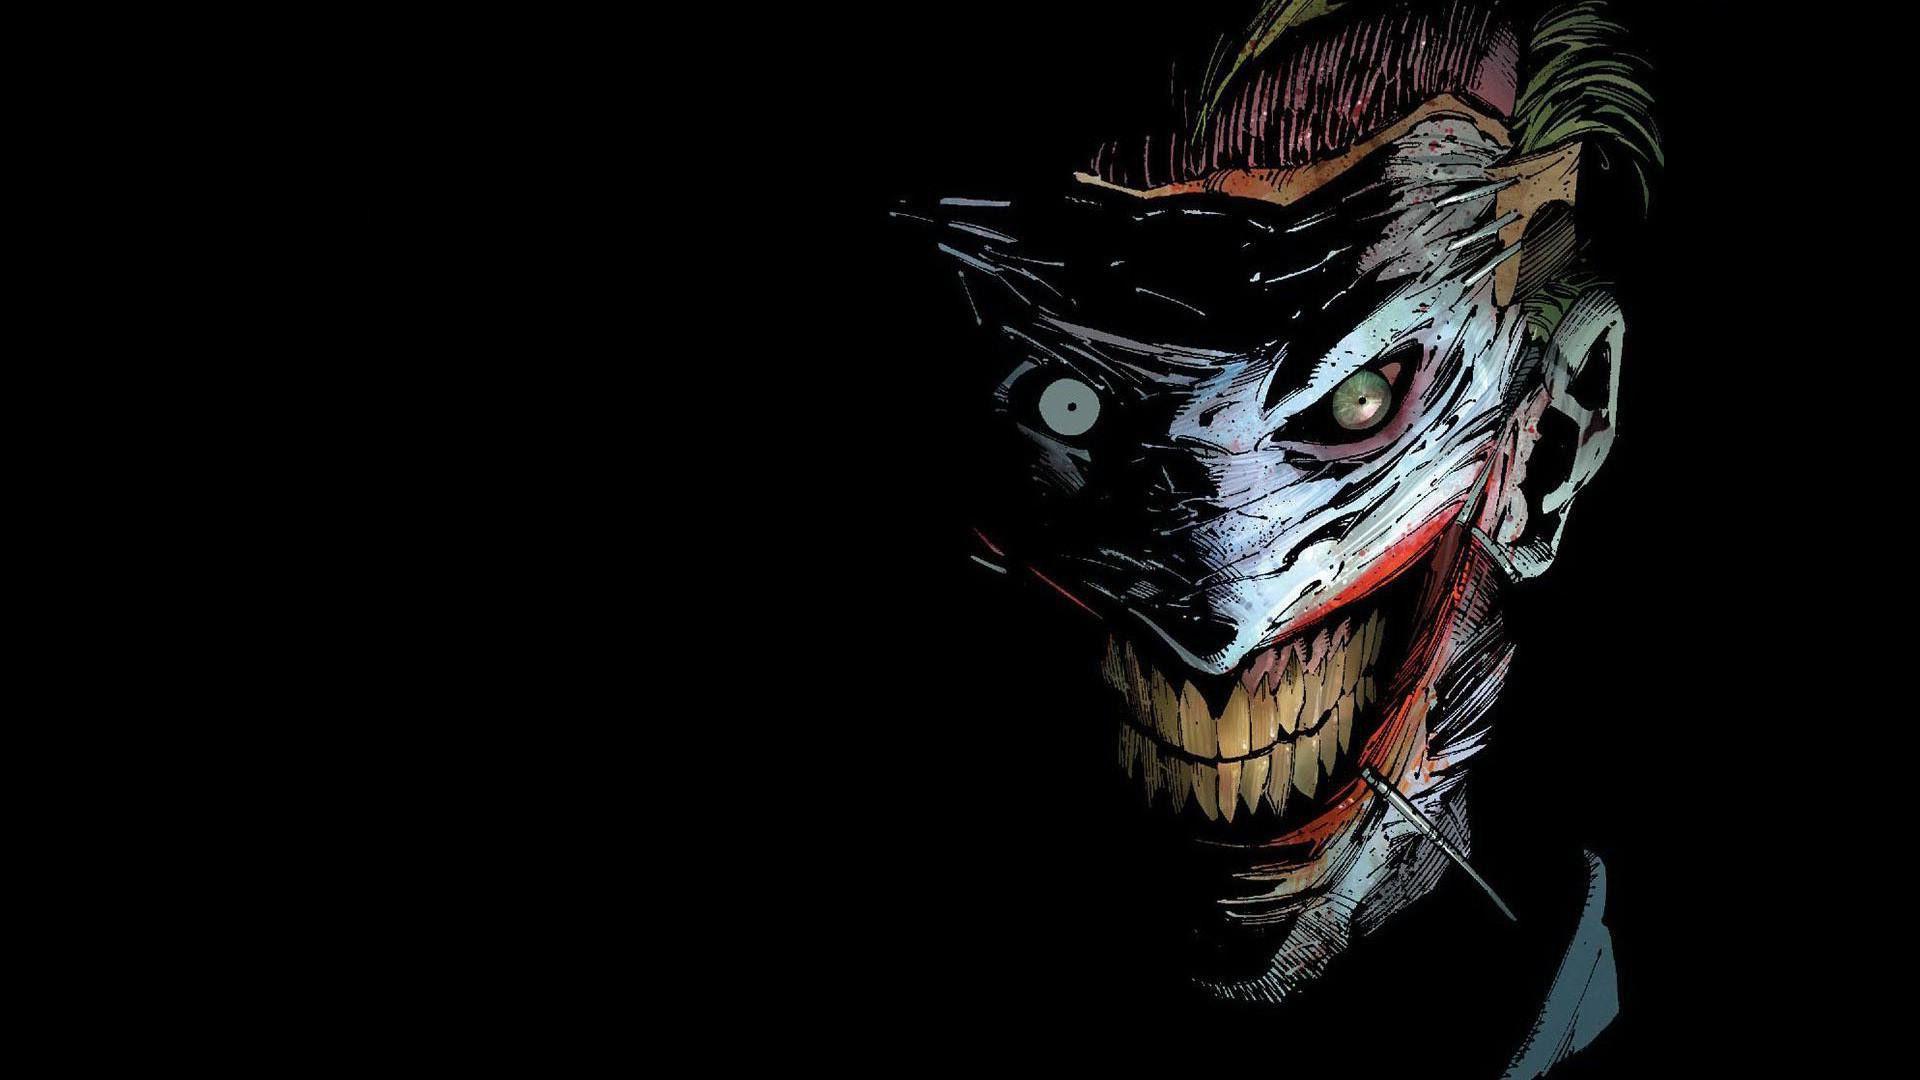 1920x1080 Amazing Cool Joker Wallpaper Hd Joker